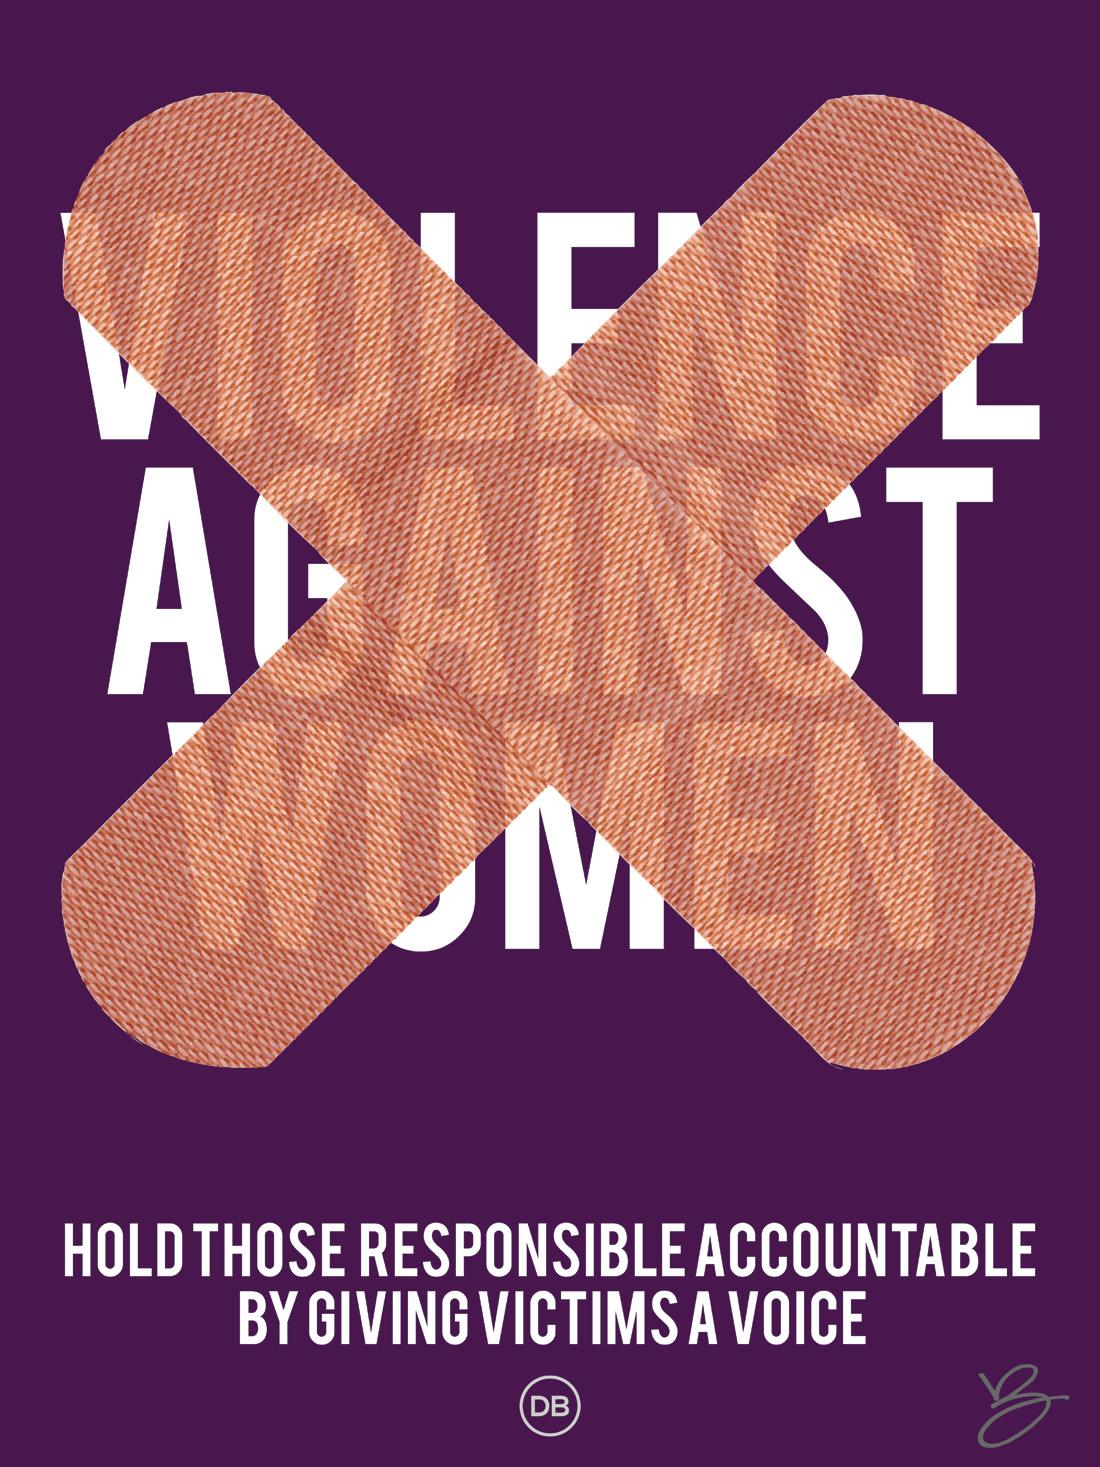 David Bernie Violence against Women VAWA Indian Country 52 Week 6